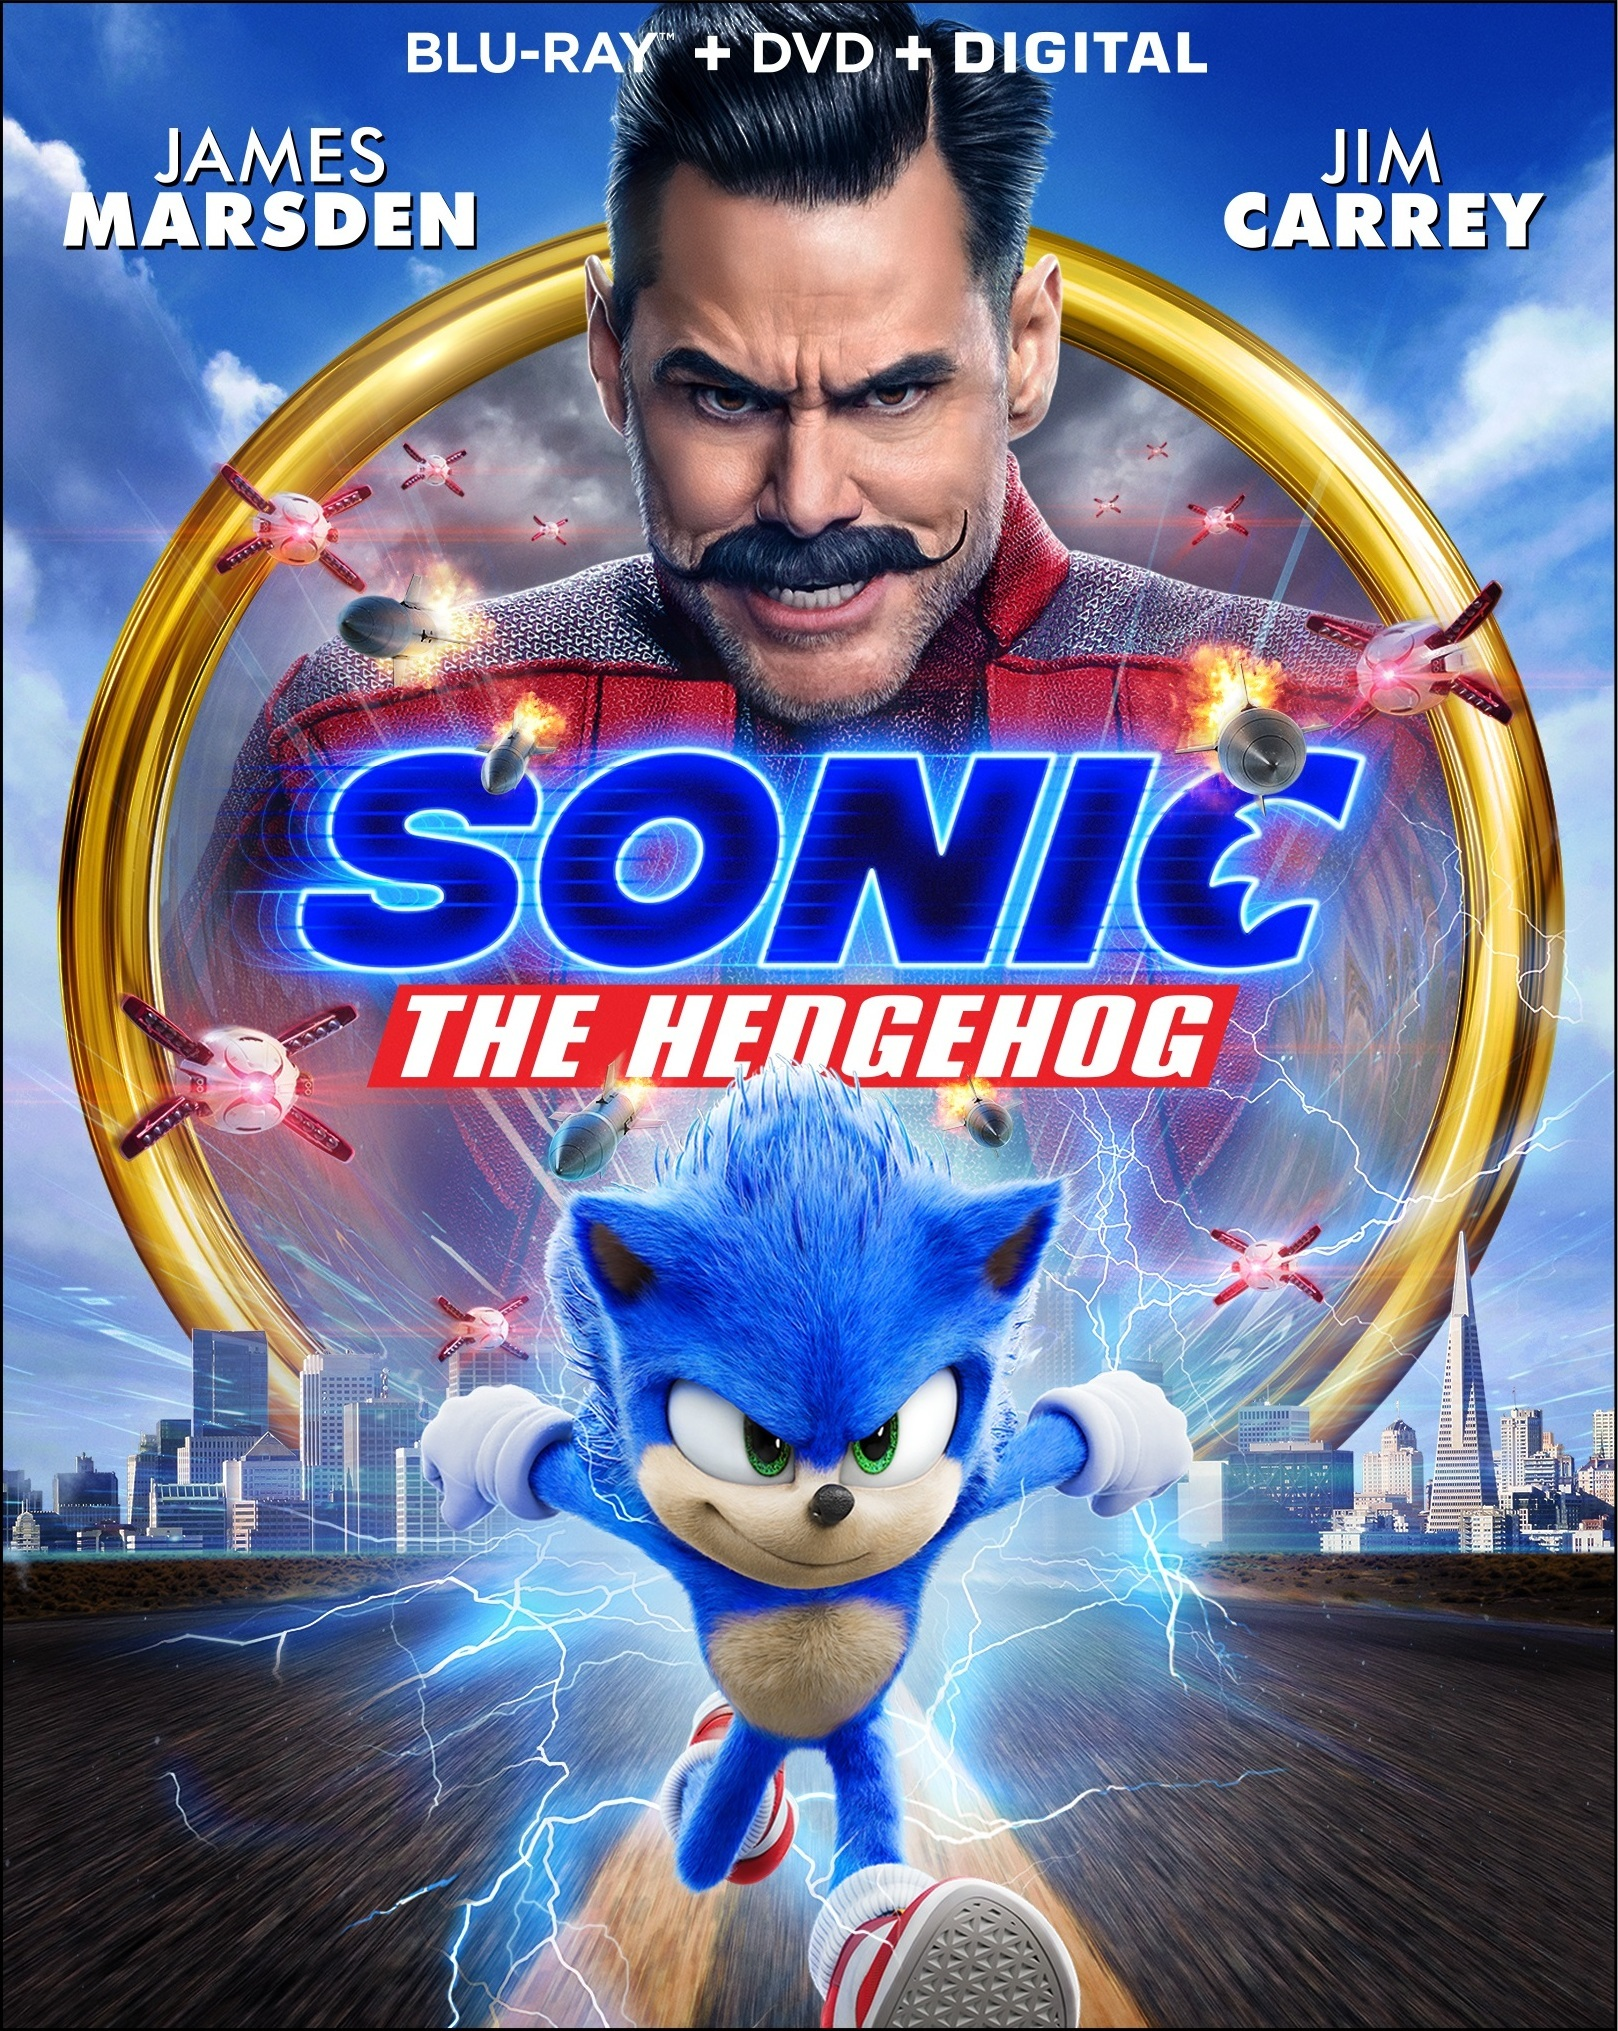 Sonic The Hedgehog Speeding To Digital Hd Early Full 4k Ultra Hd